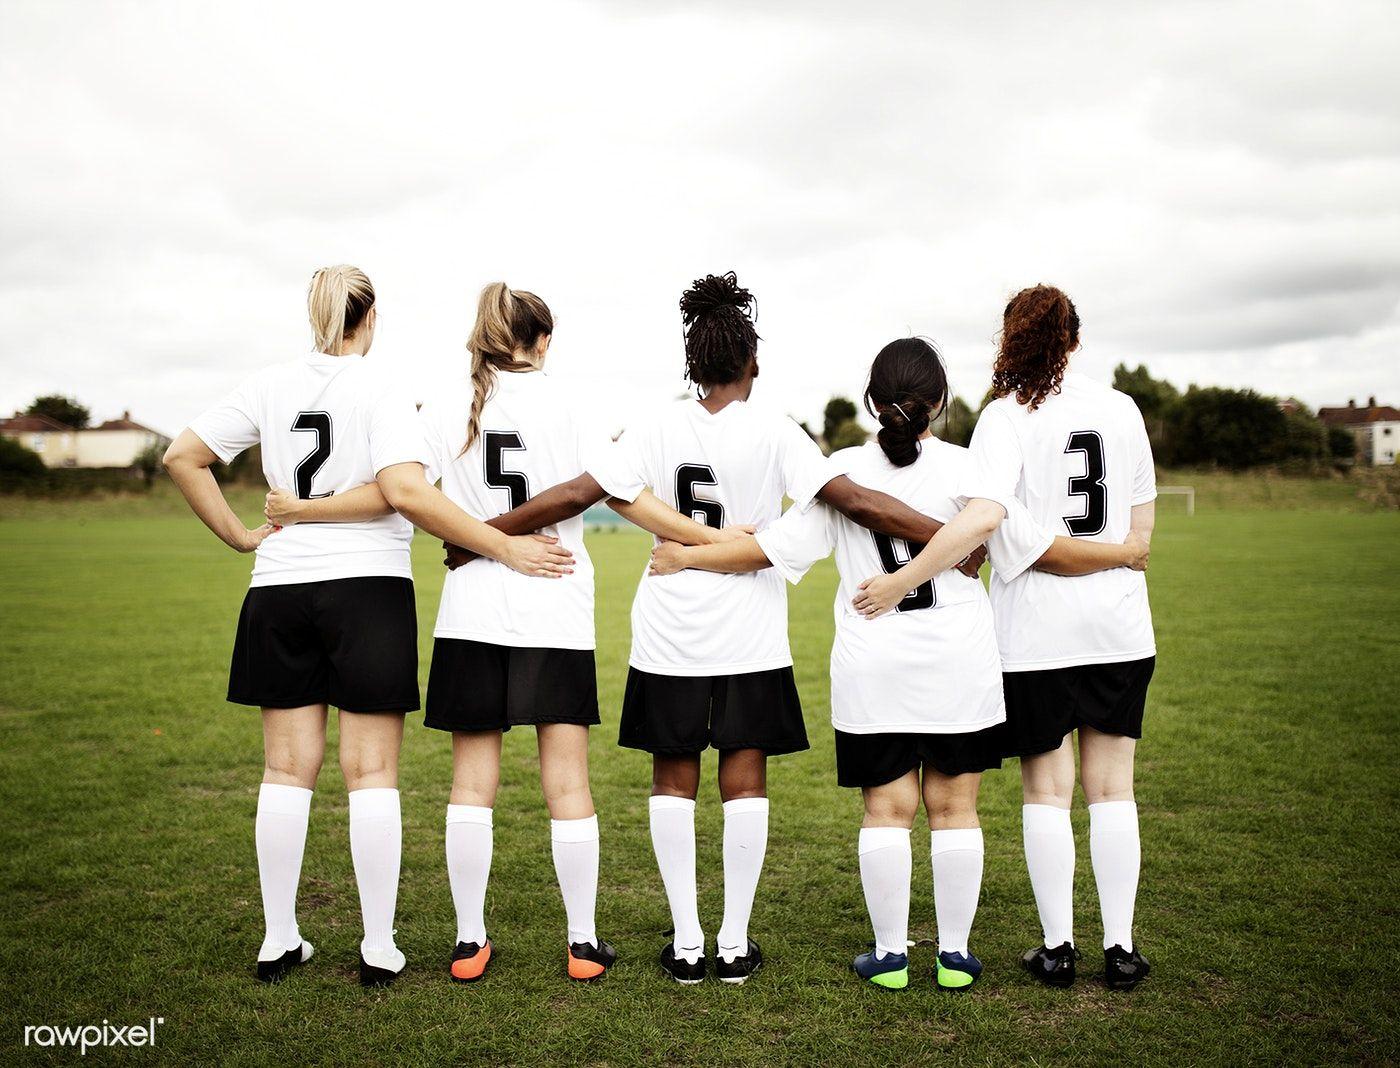 Download Premium Photo Of Female Soccer Players Huddling And Standing Female Soccer Players Soccer Players Soccer